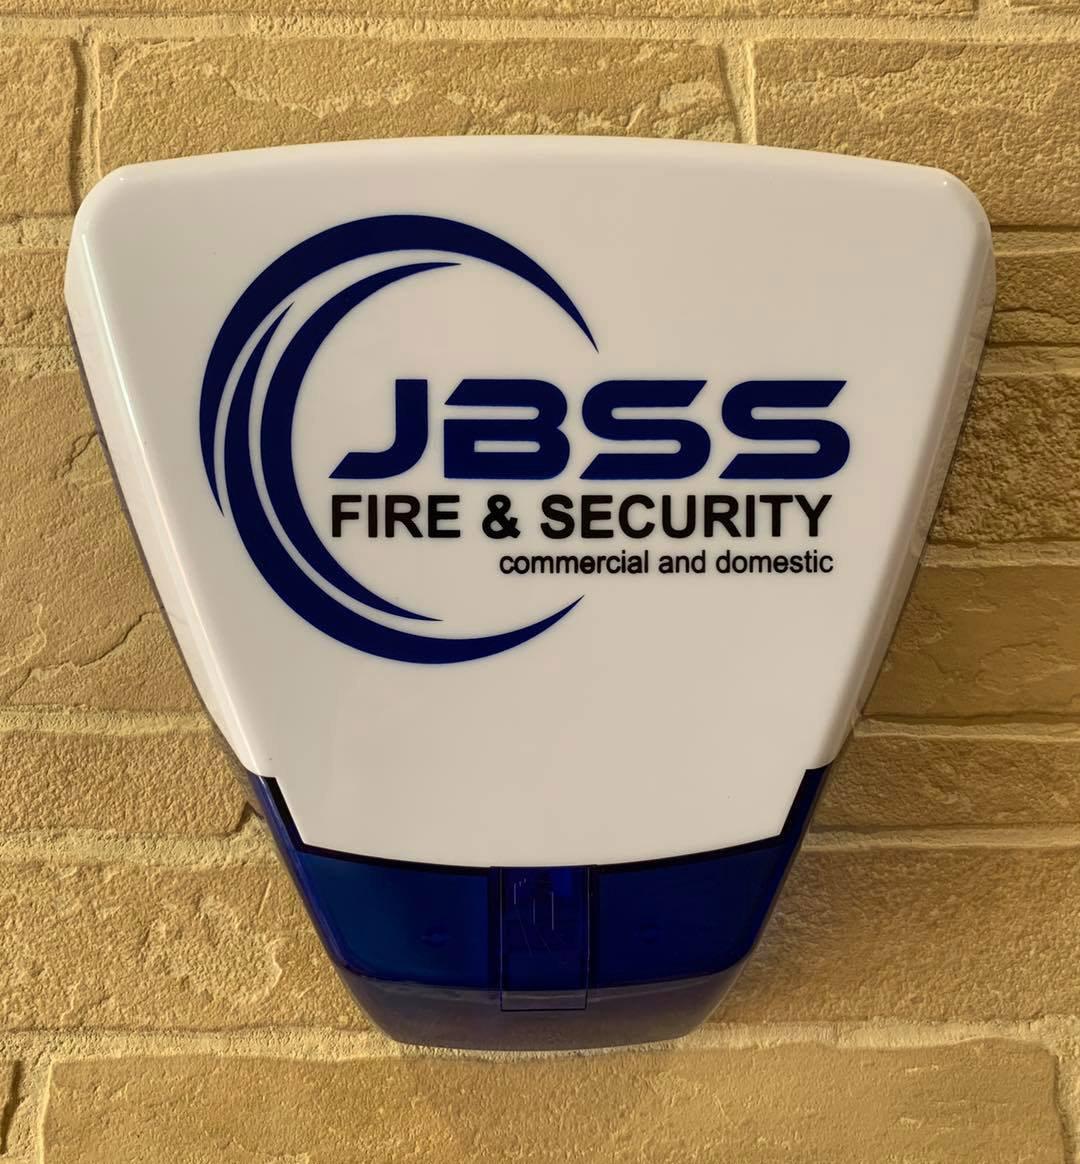 JBSS Burglar Alarm|JBSS UK